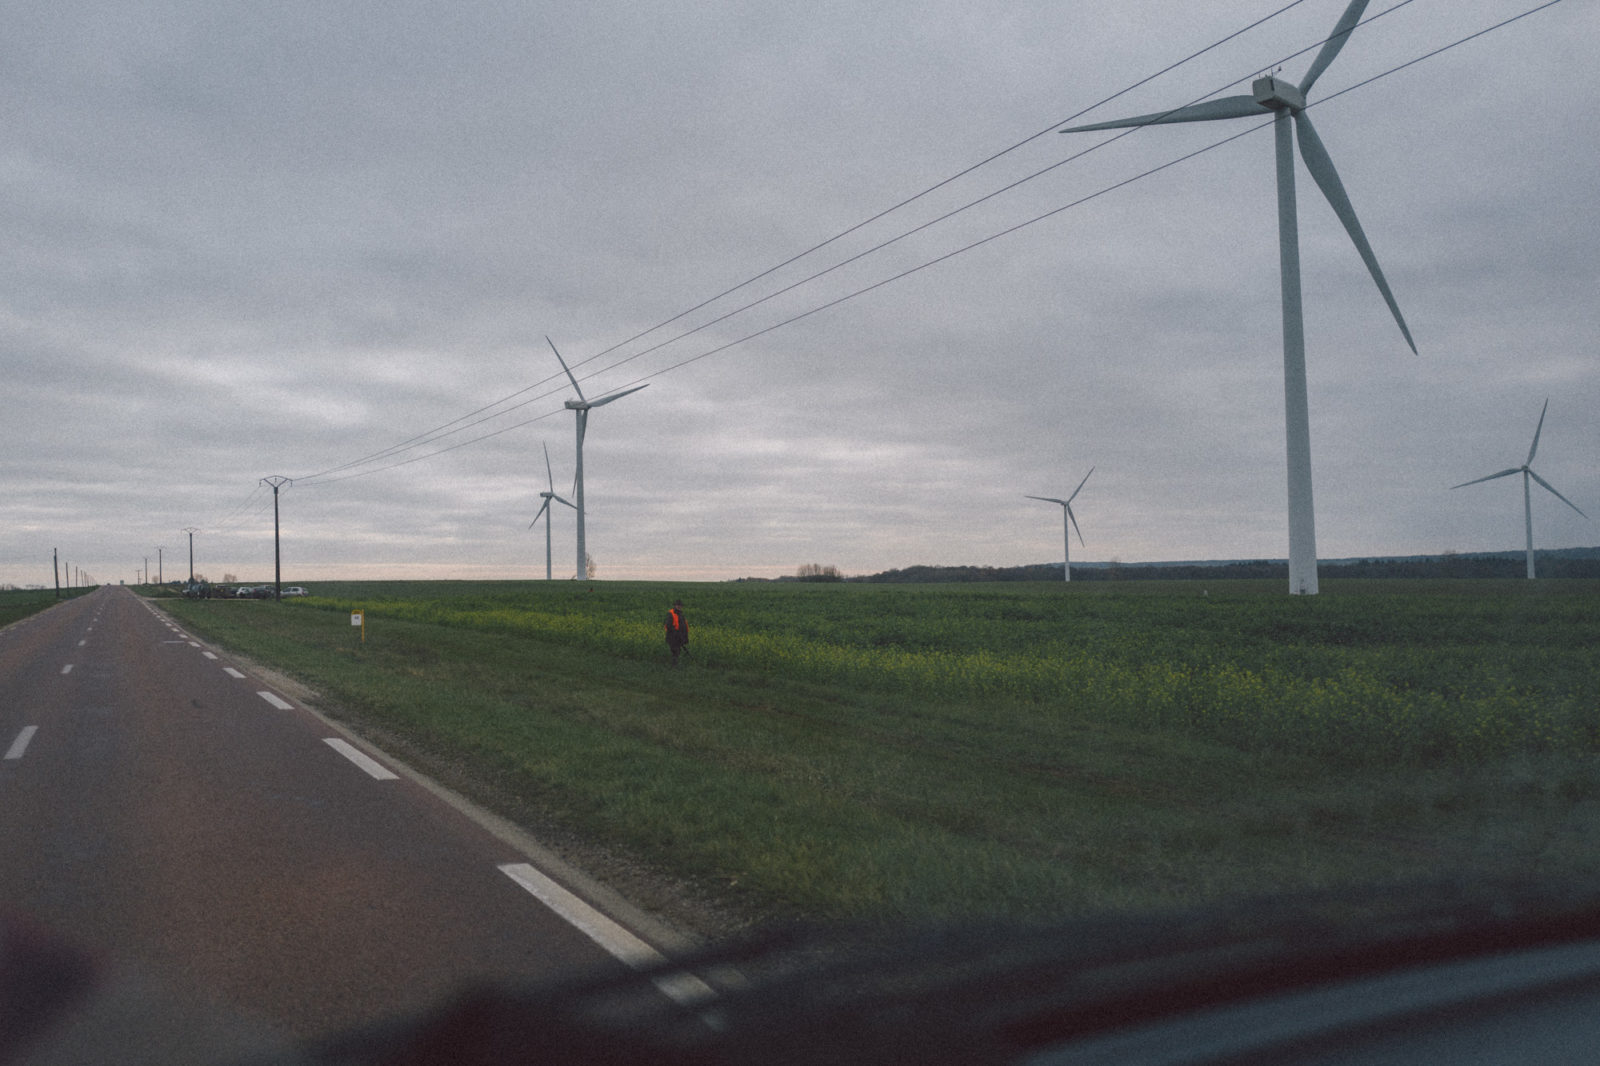 Reise-1060453